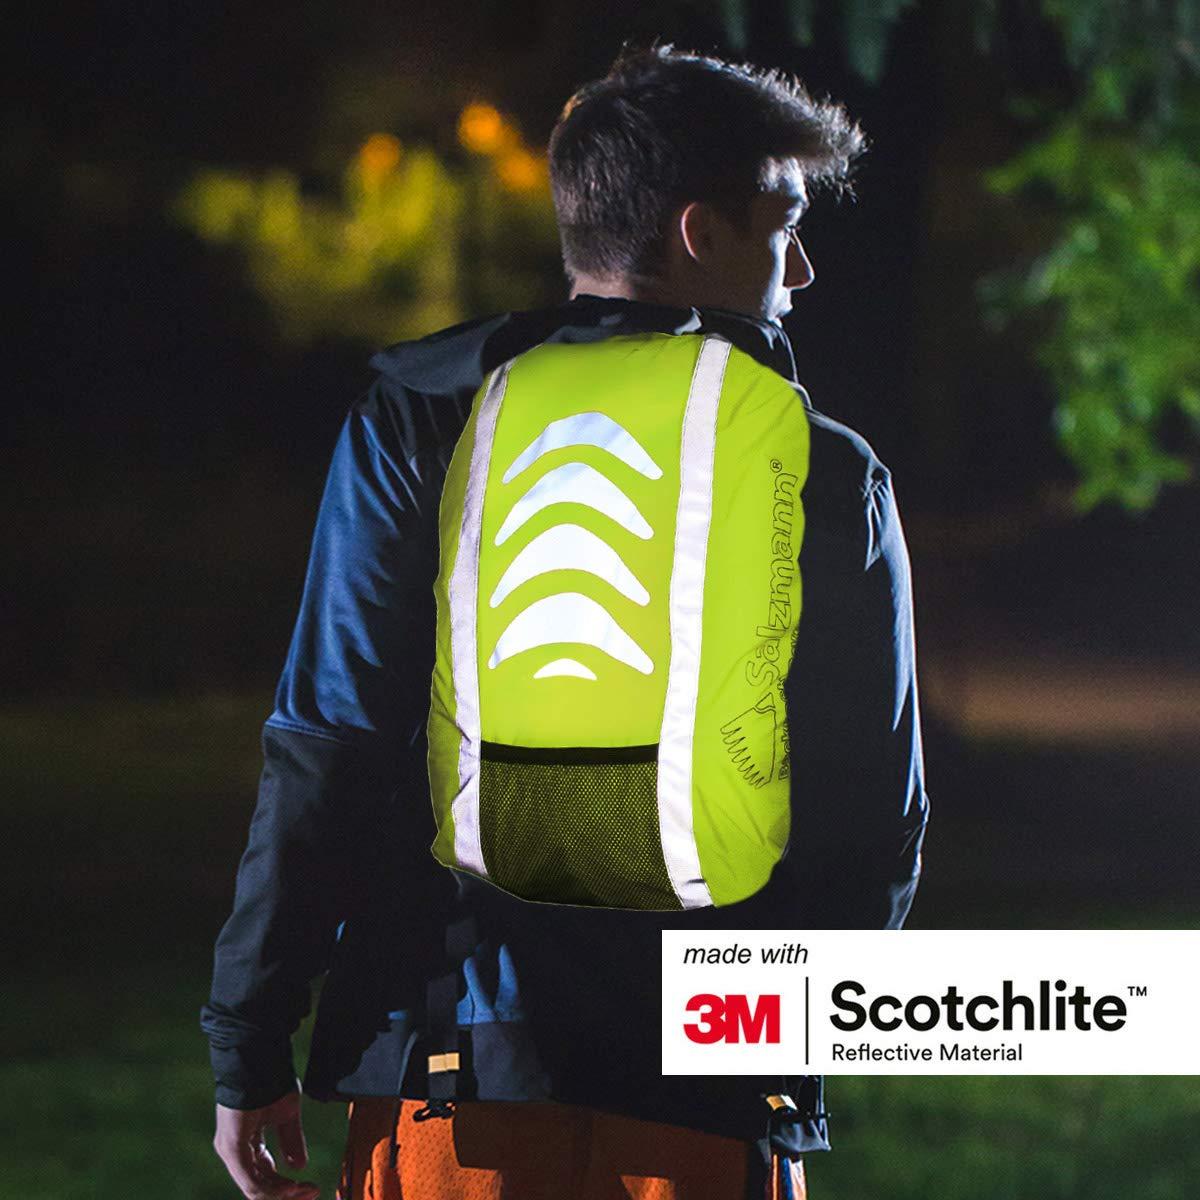 Alta Visibilidad Equipada con 3M Scotchlite Impermeable Salzmann 3M Cubierta de Mochila Reflectante